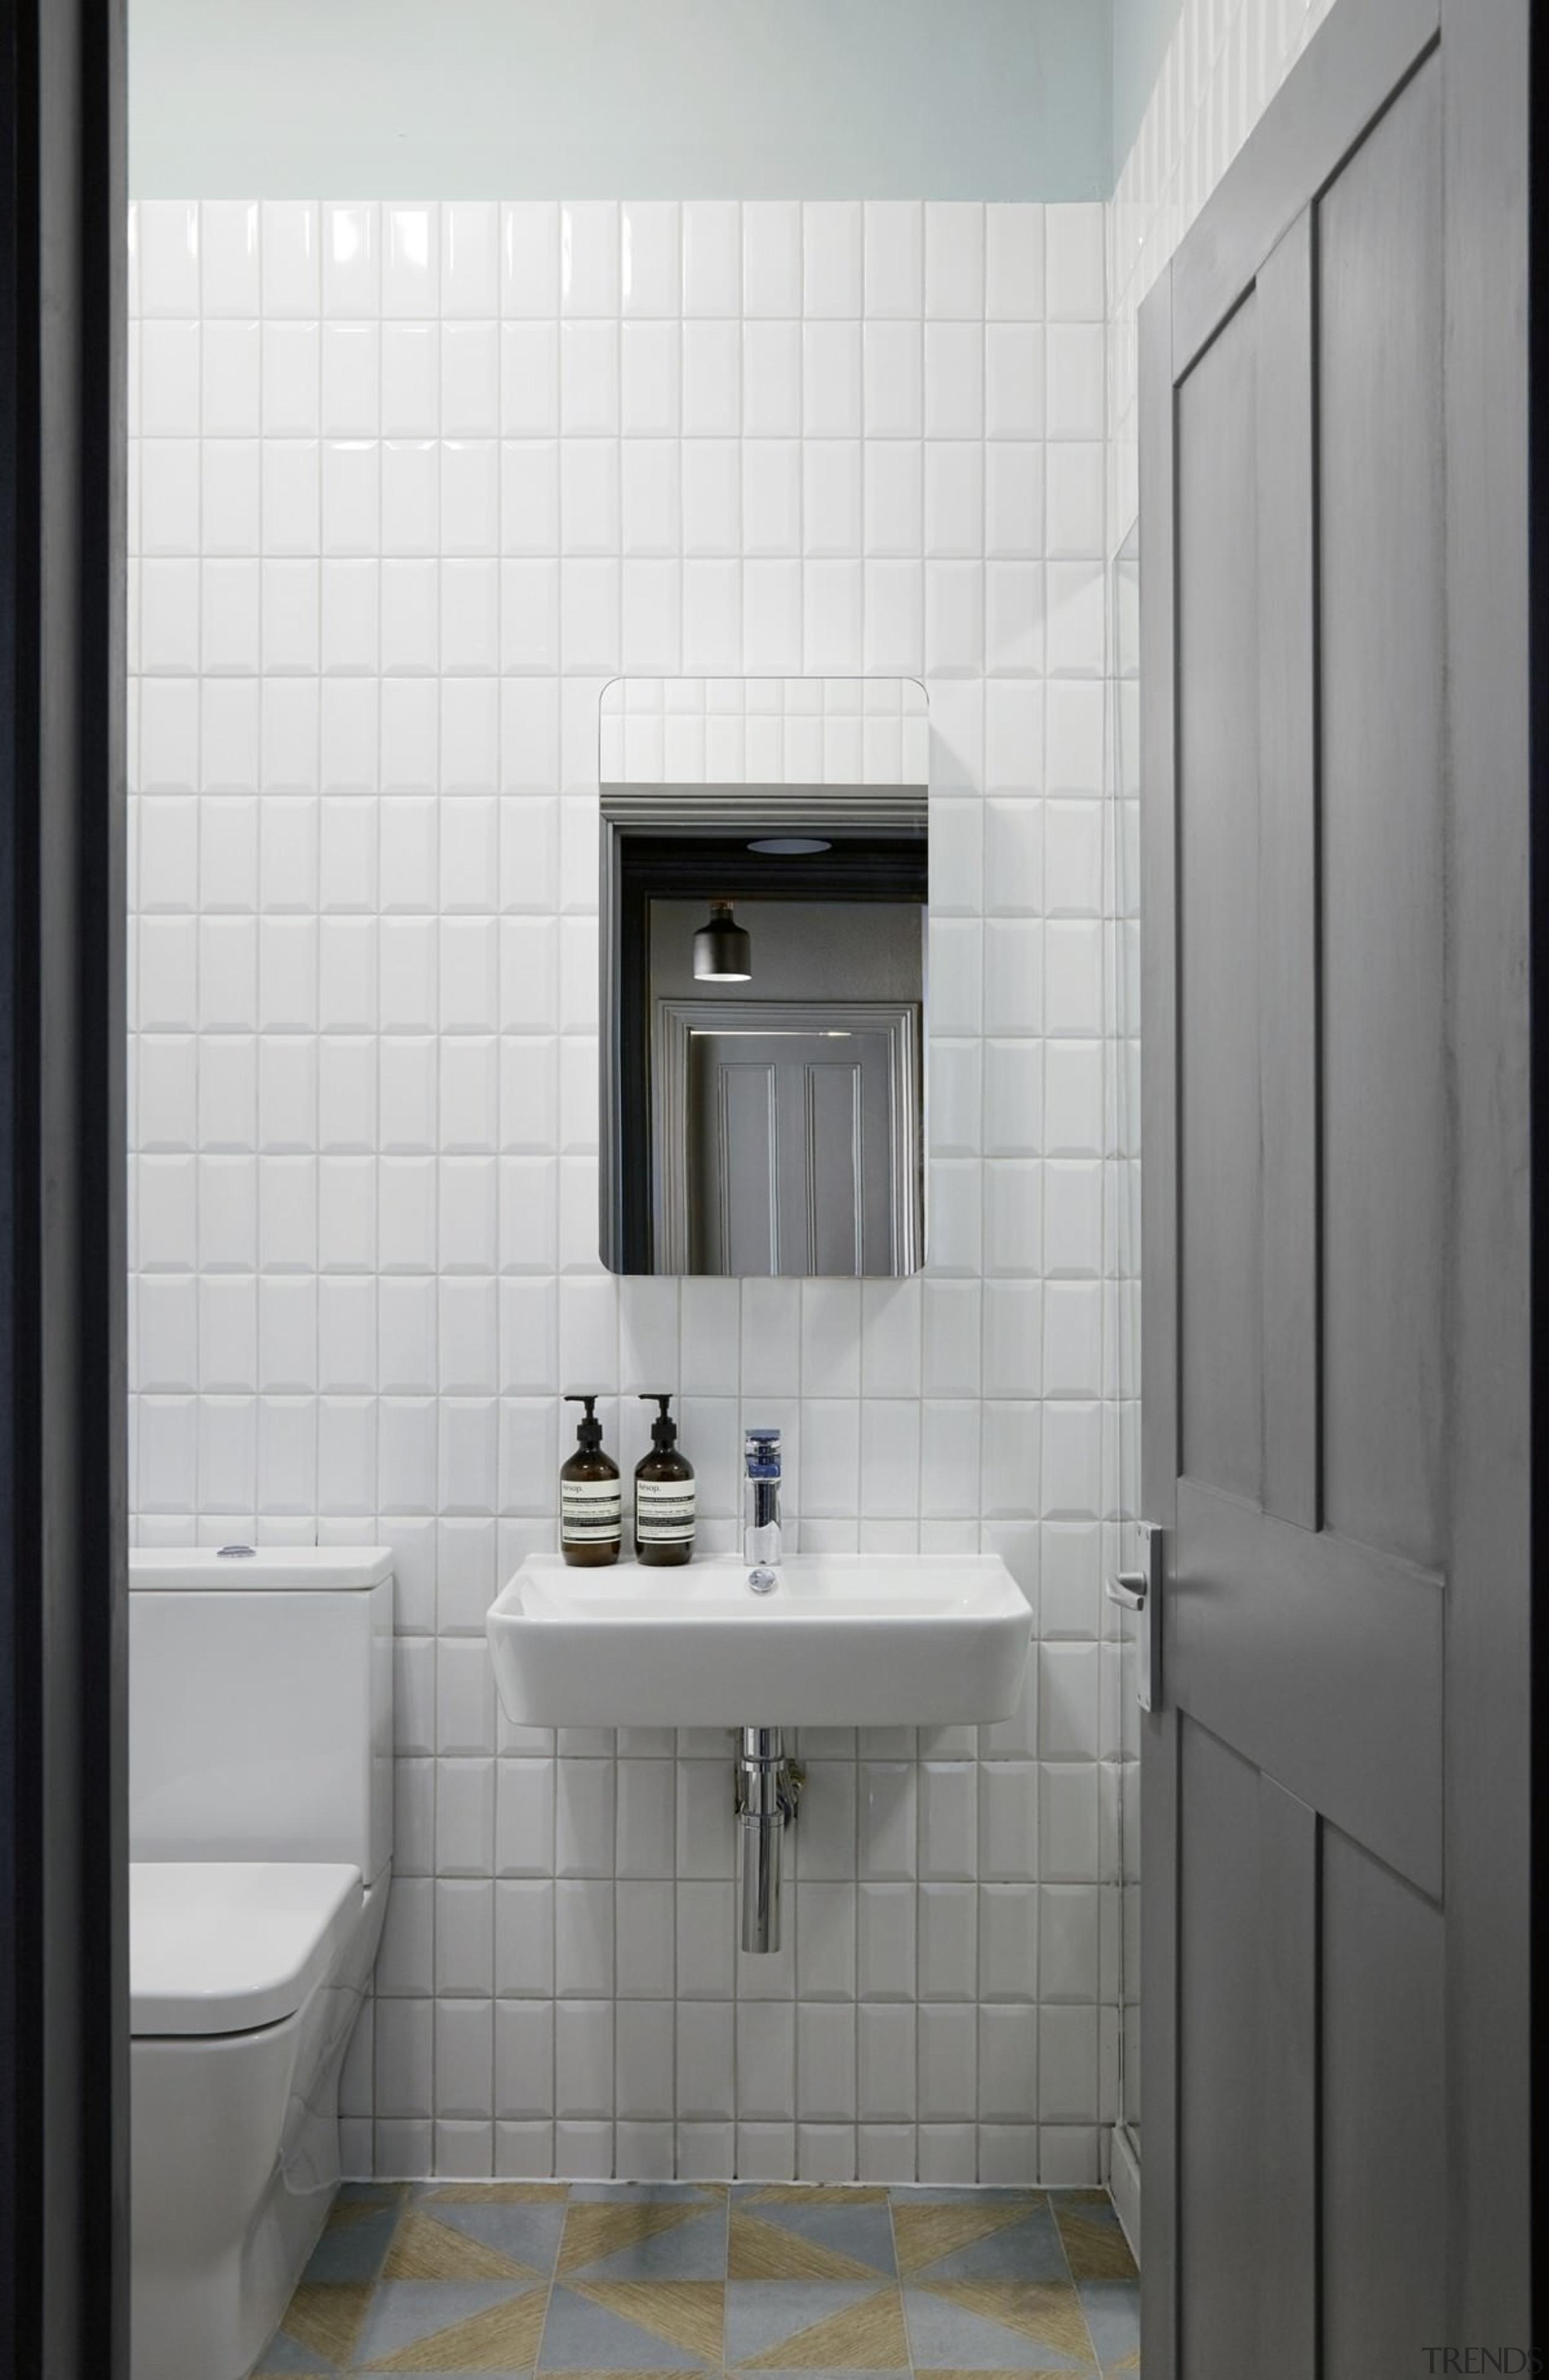 White tiles keep the bathroom feeling open - bathroom, bathroom accessory, bathroom cabinet, floor, interior design, plumbing fixture, product design, room, sink, tile, gray